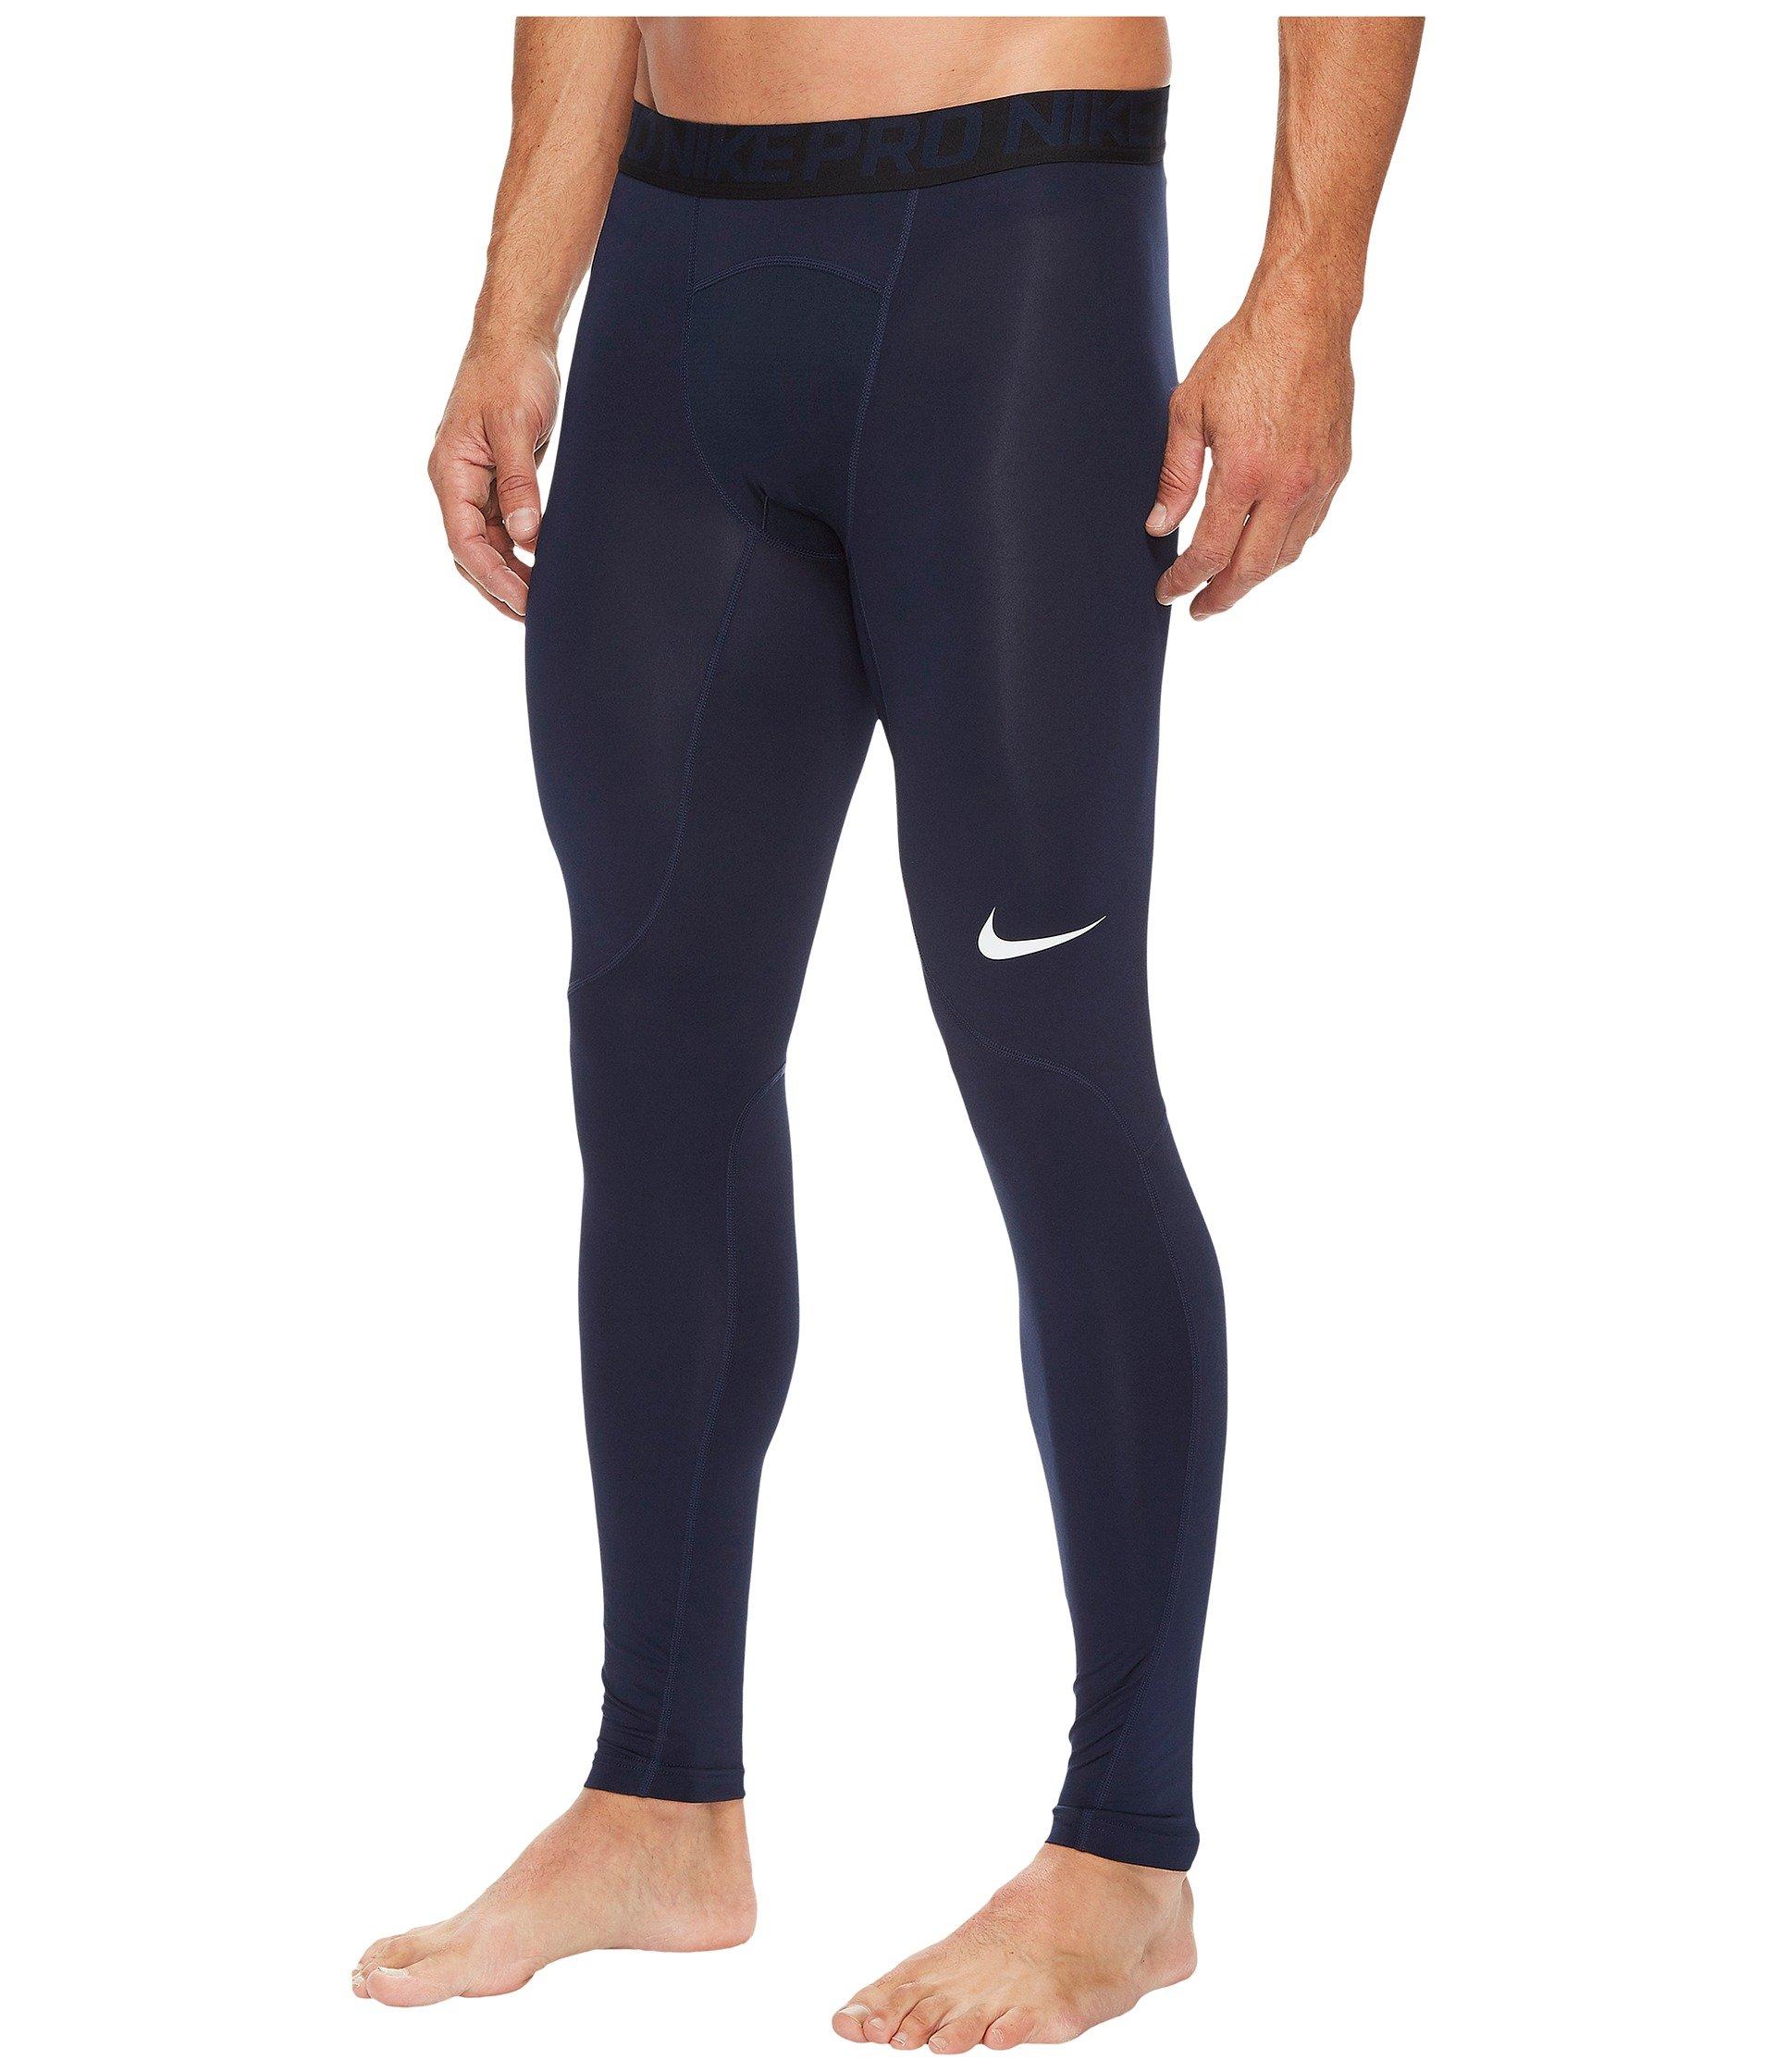 NIKE Men's Pro Tight by Nike (Image #3)